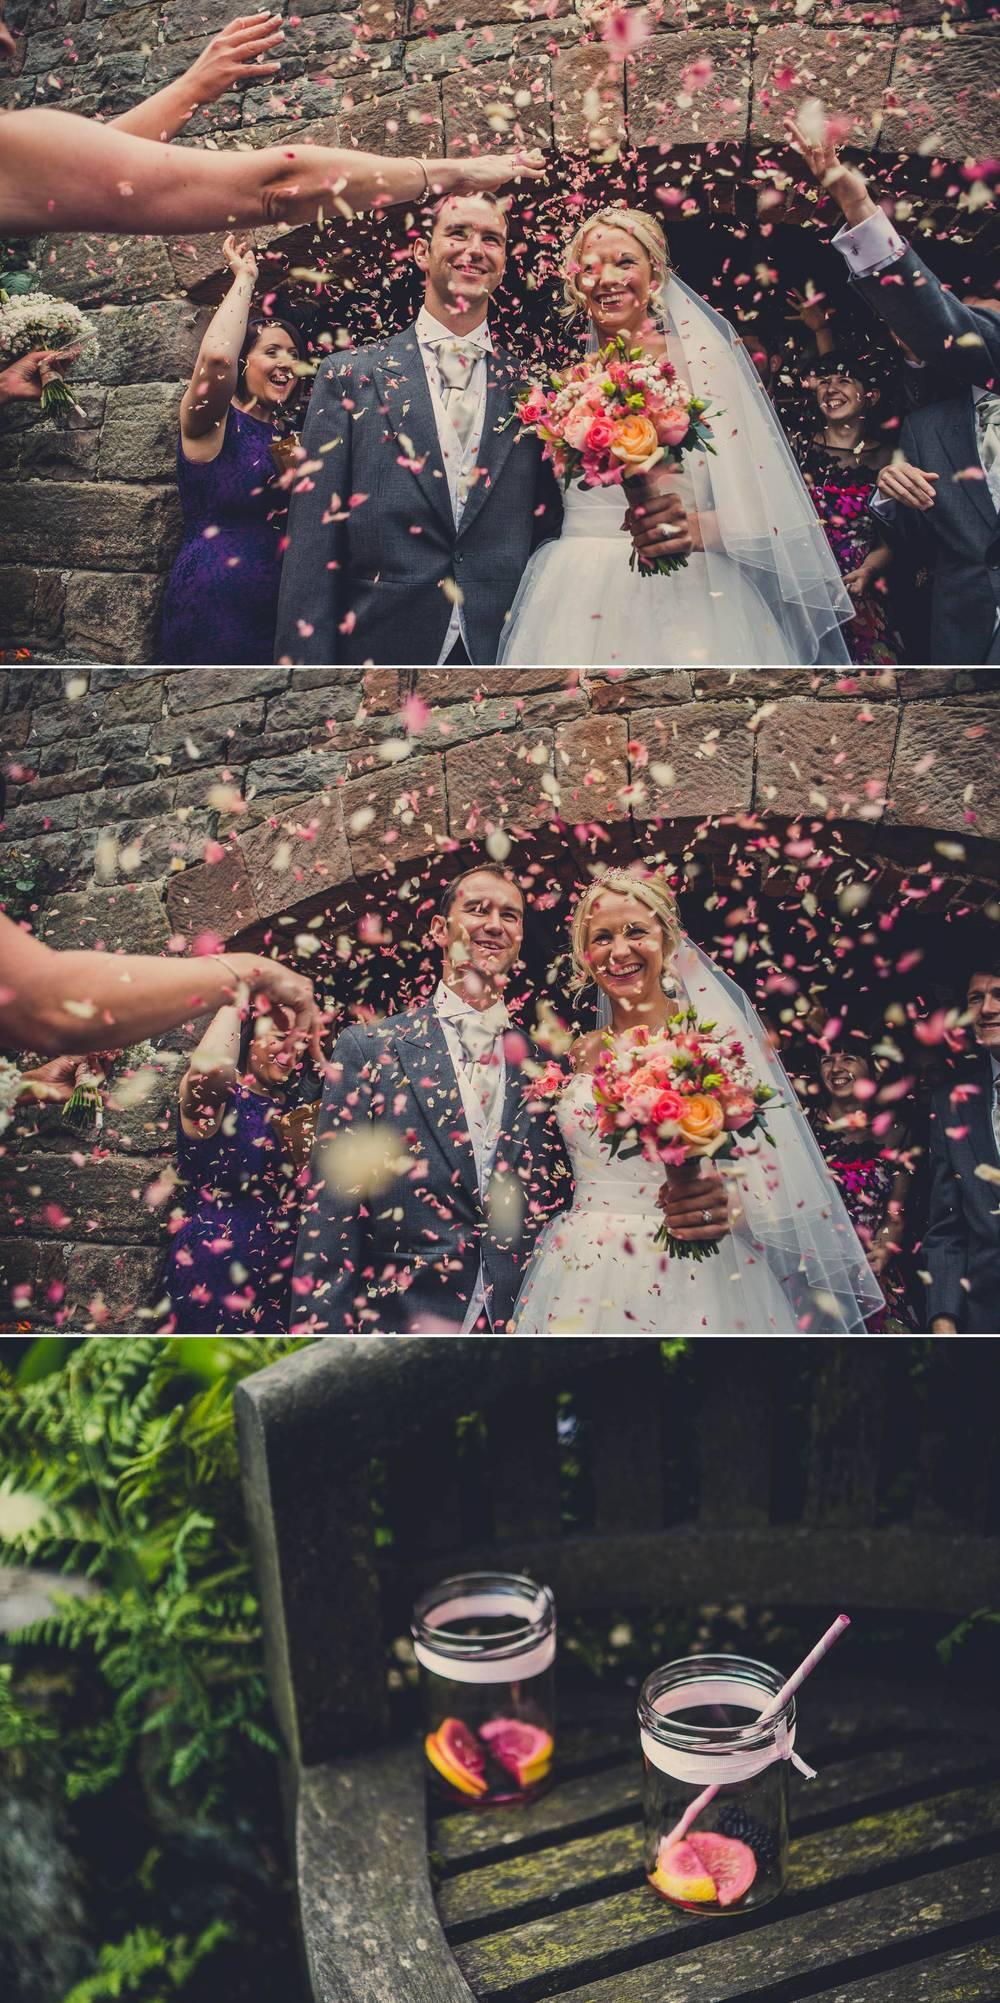 the-ashes-wedding-photographer 10.jpg